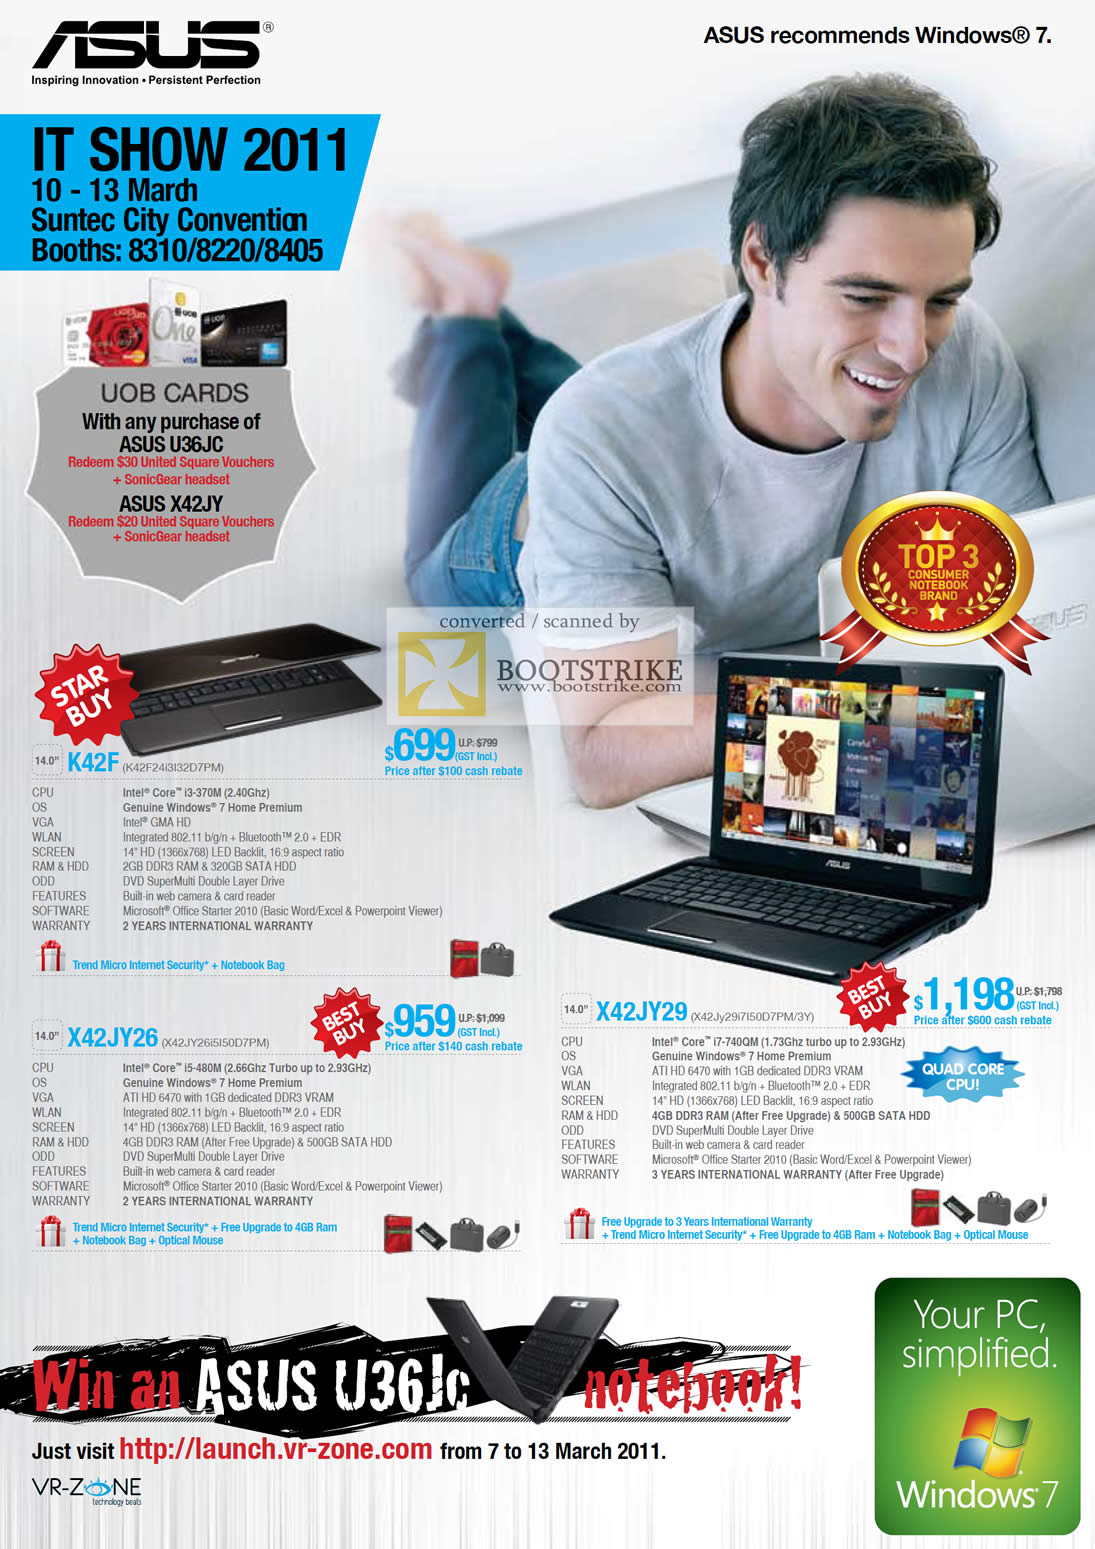 IT Show 2011 price list image brochure of ASUS Notebooks K42F X42JY26 X42JY29